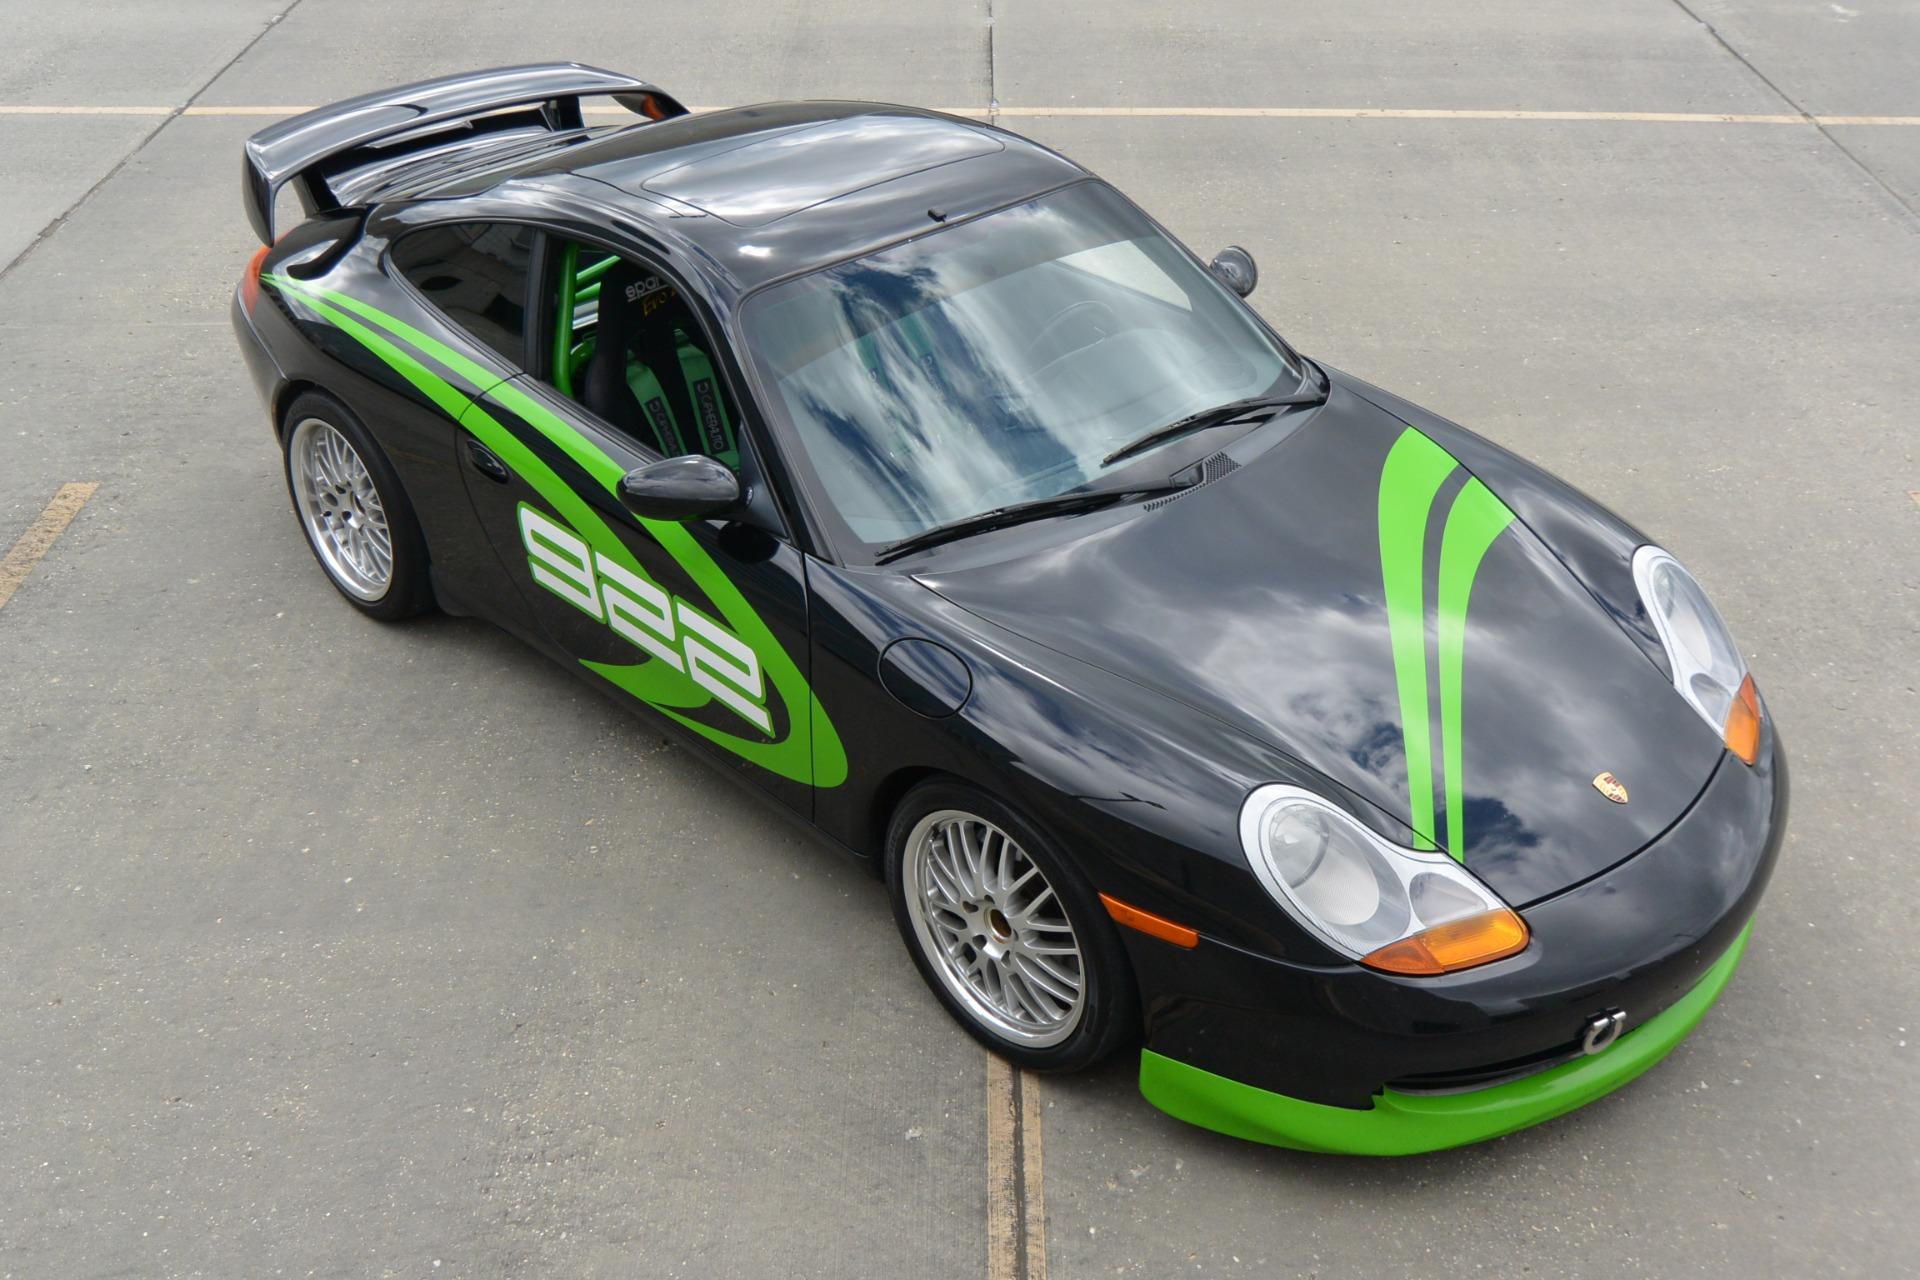 1999 Porsche 911 Carrera Race Car (Street Legal) Stock # CXS622169 ...